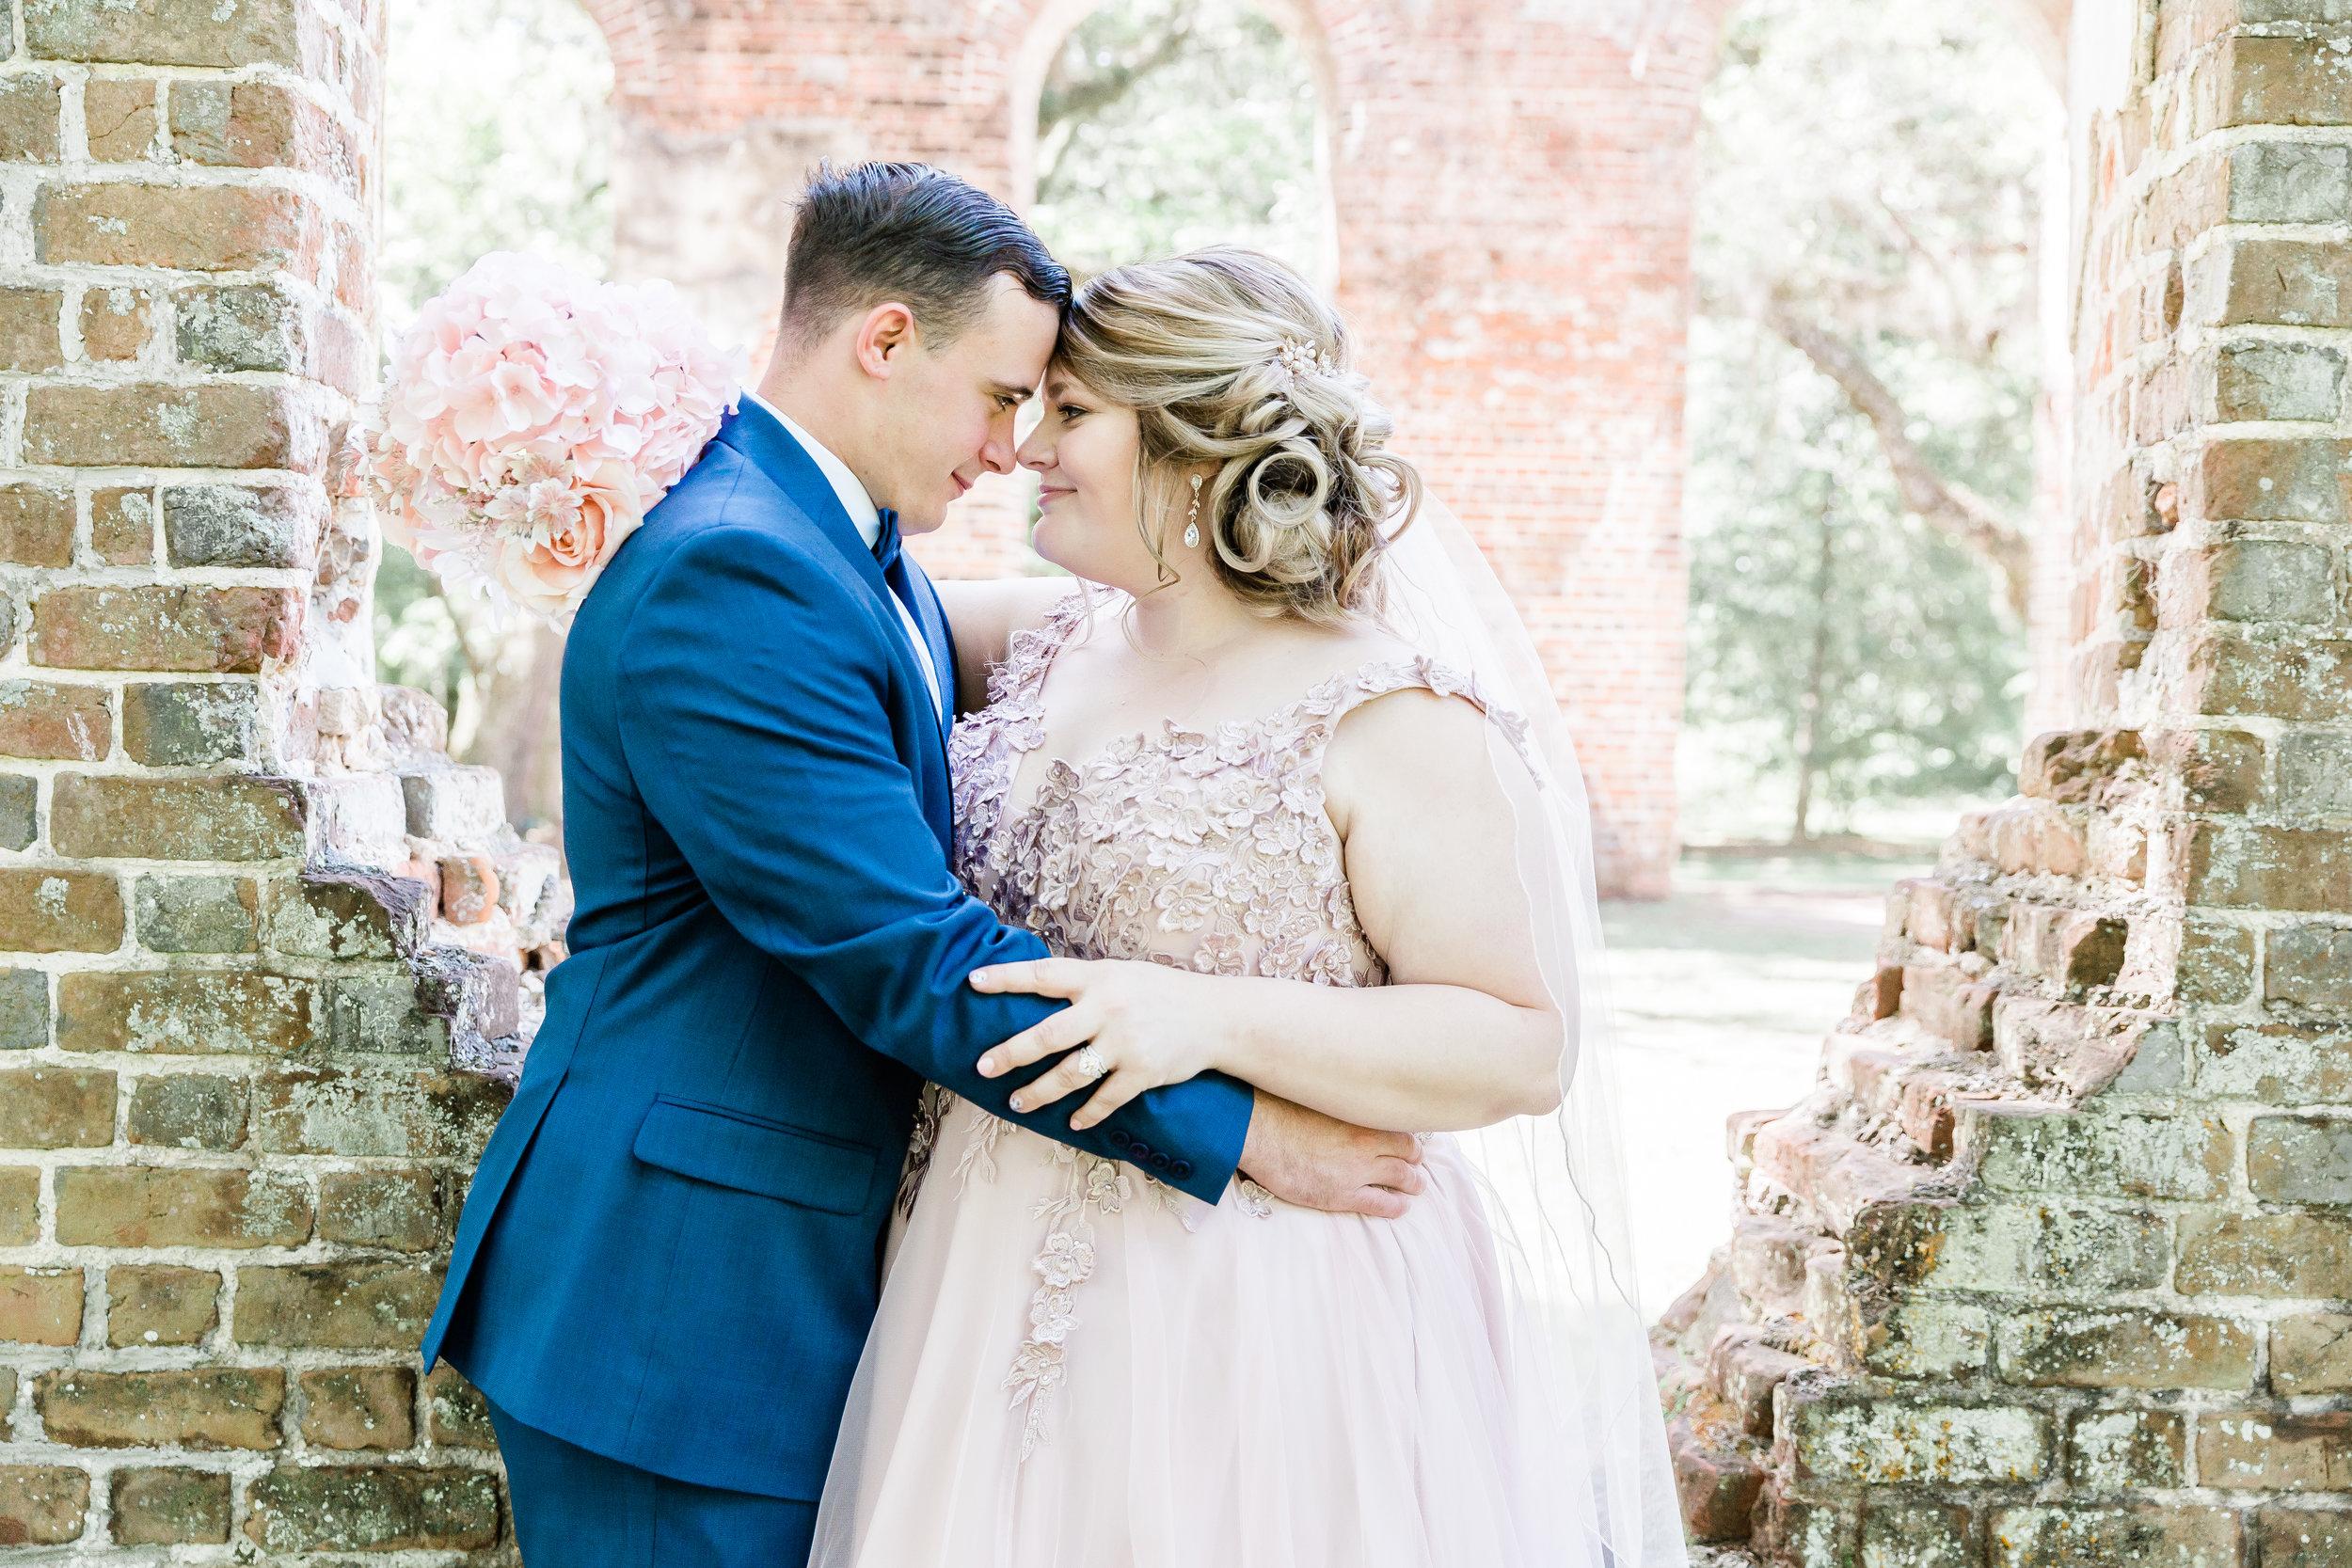 20190417-Southern Lens Photography-savannah family photographer- Ashley and Zack-old sheldon church ruins-201961.jpg